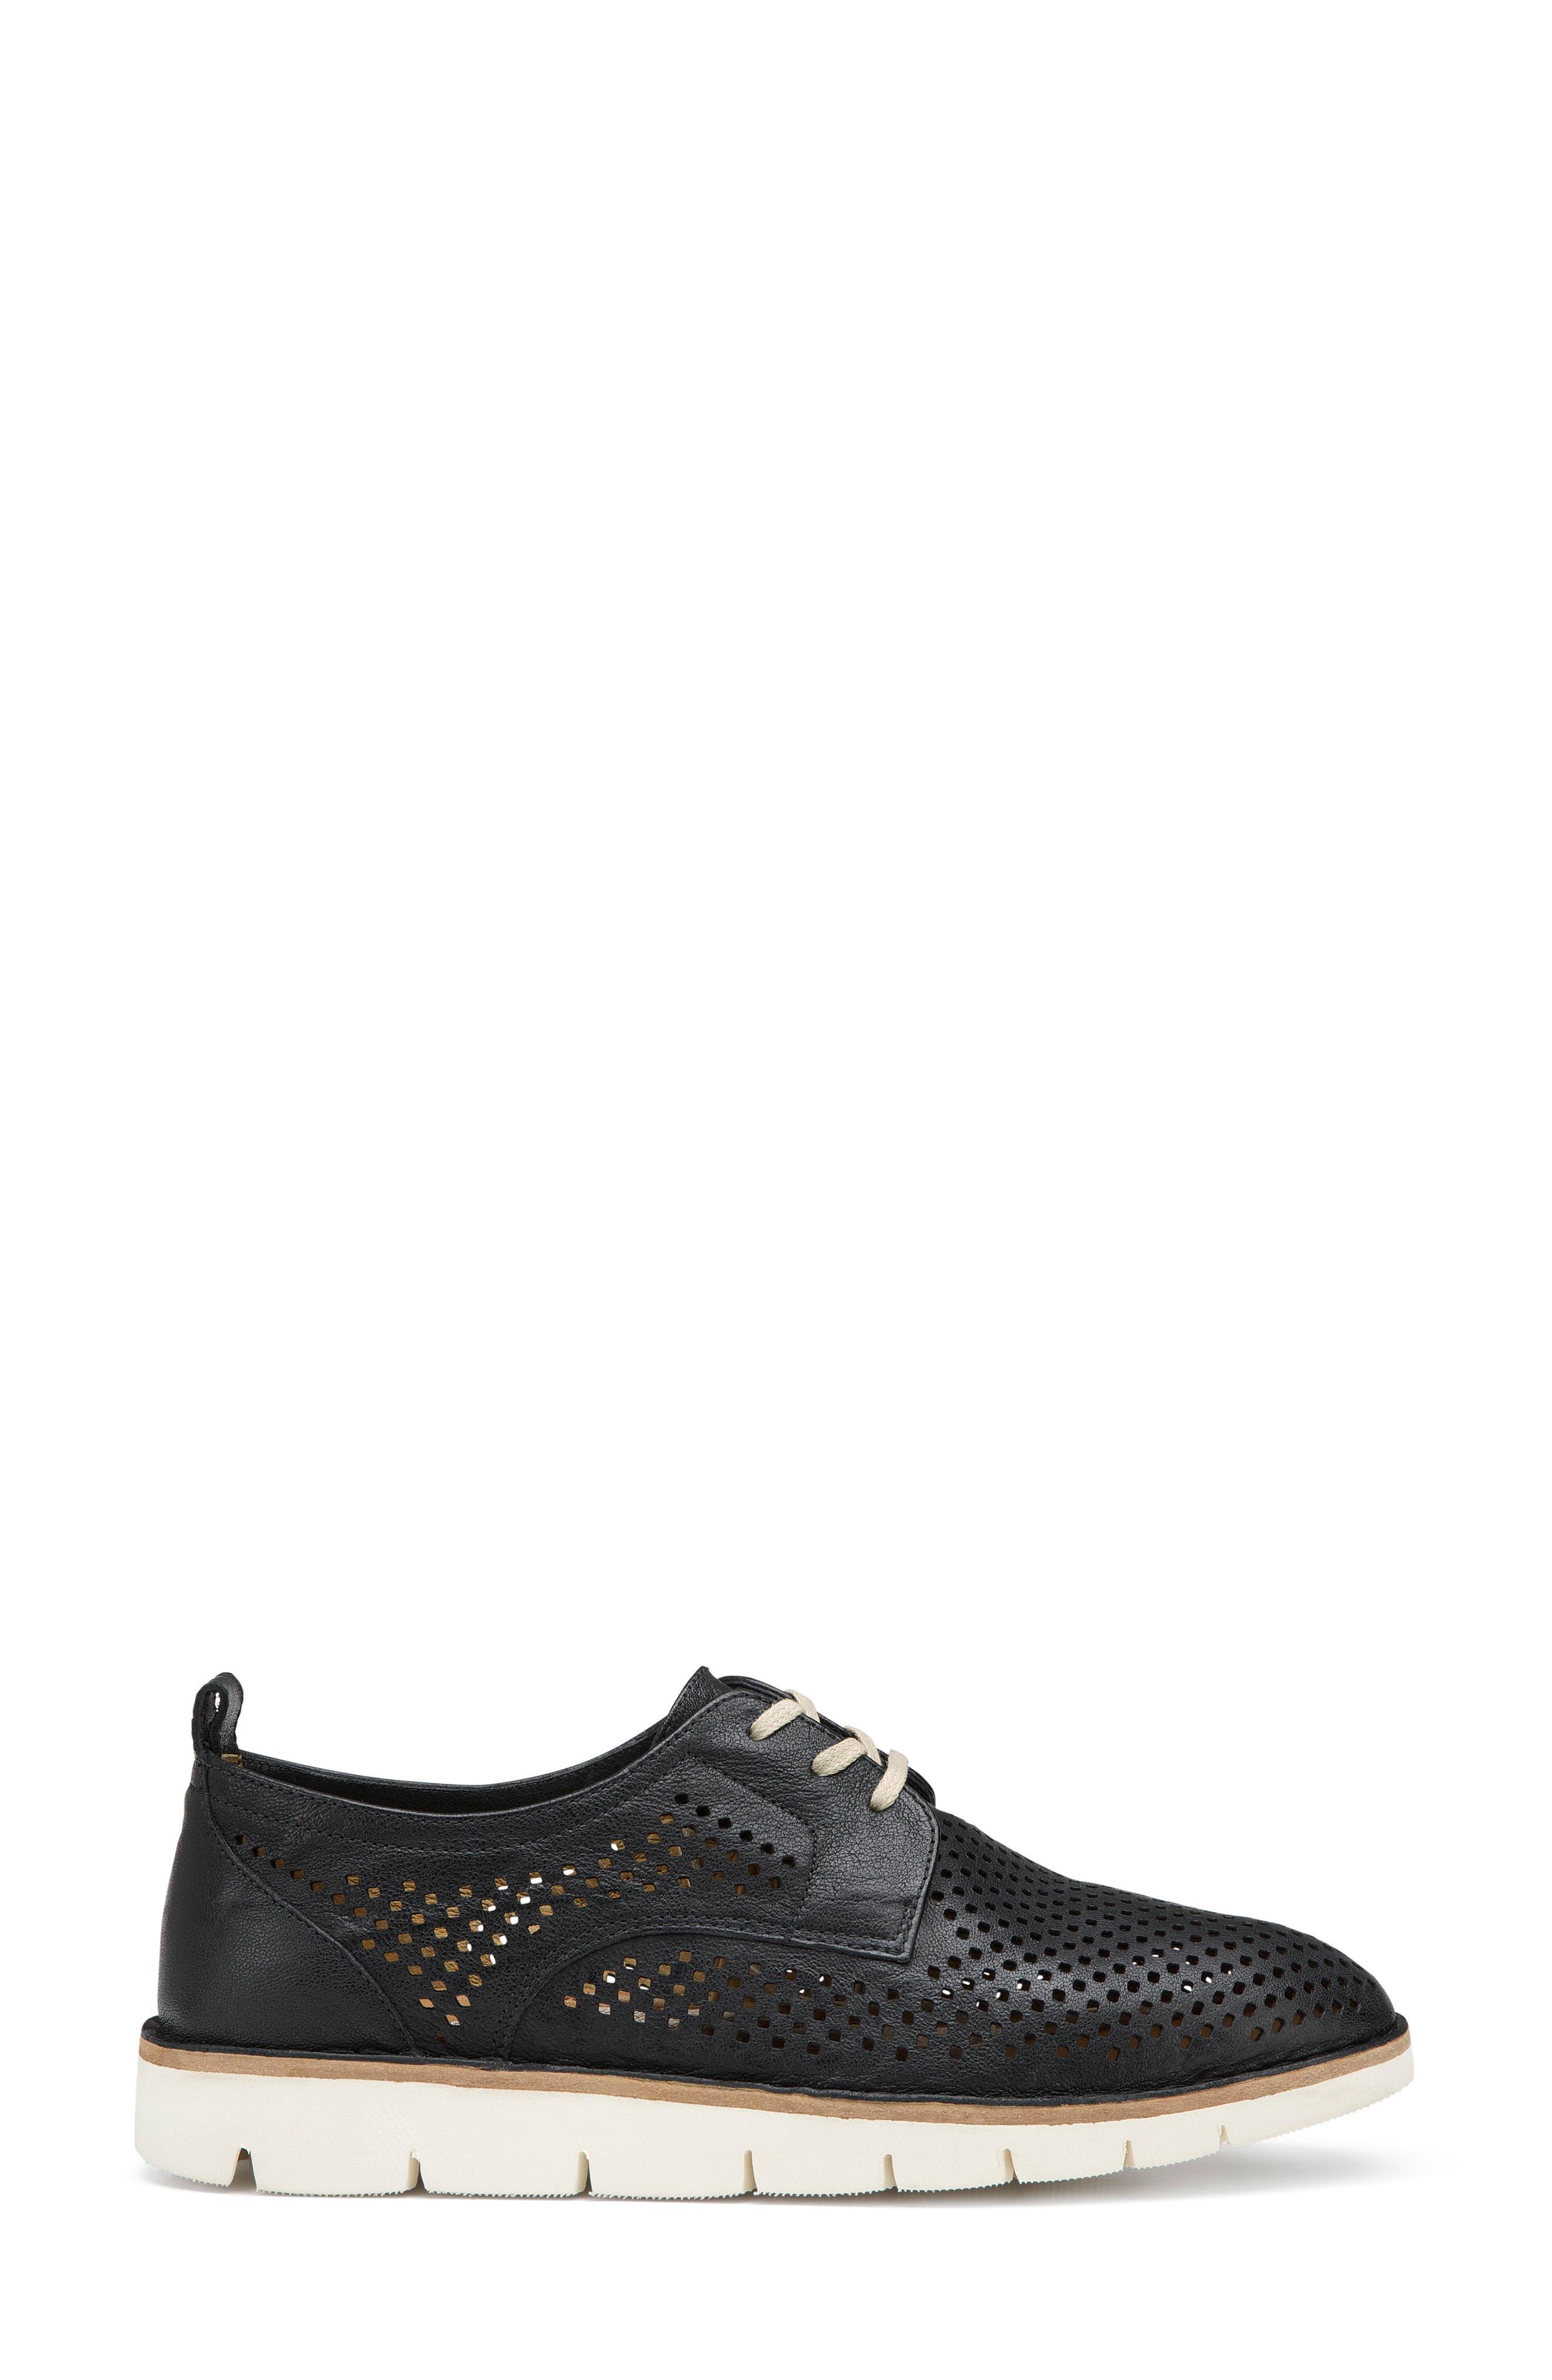 Lena Sneaker,                             Alternate thumbnail 3, color,                             Black Leather